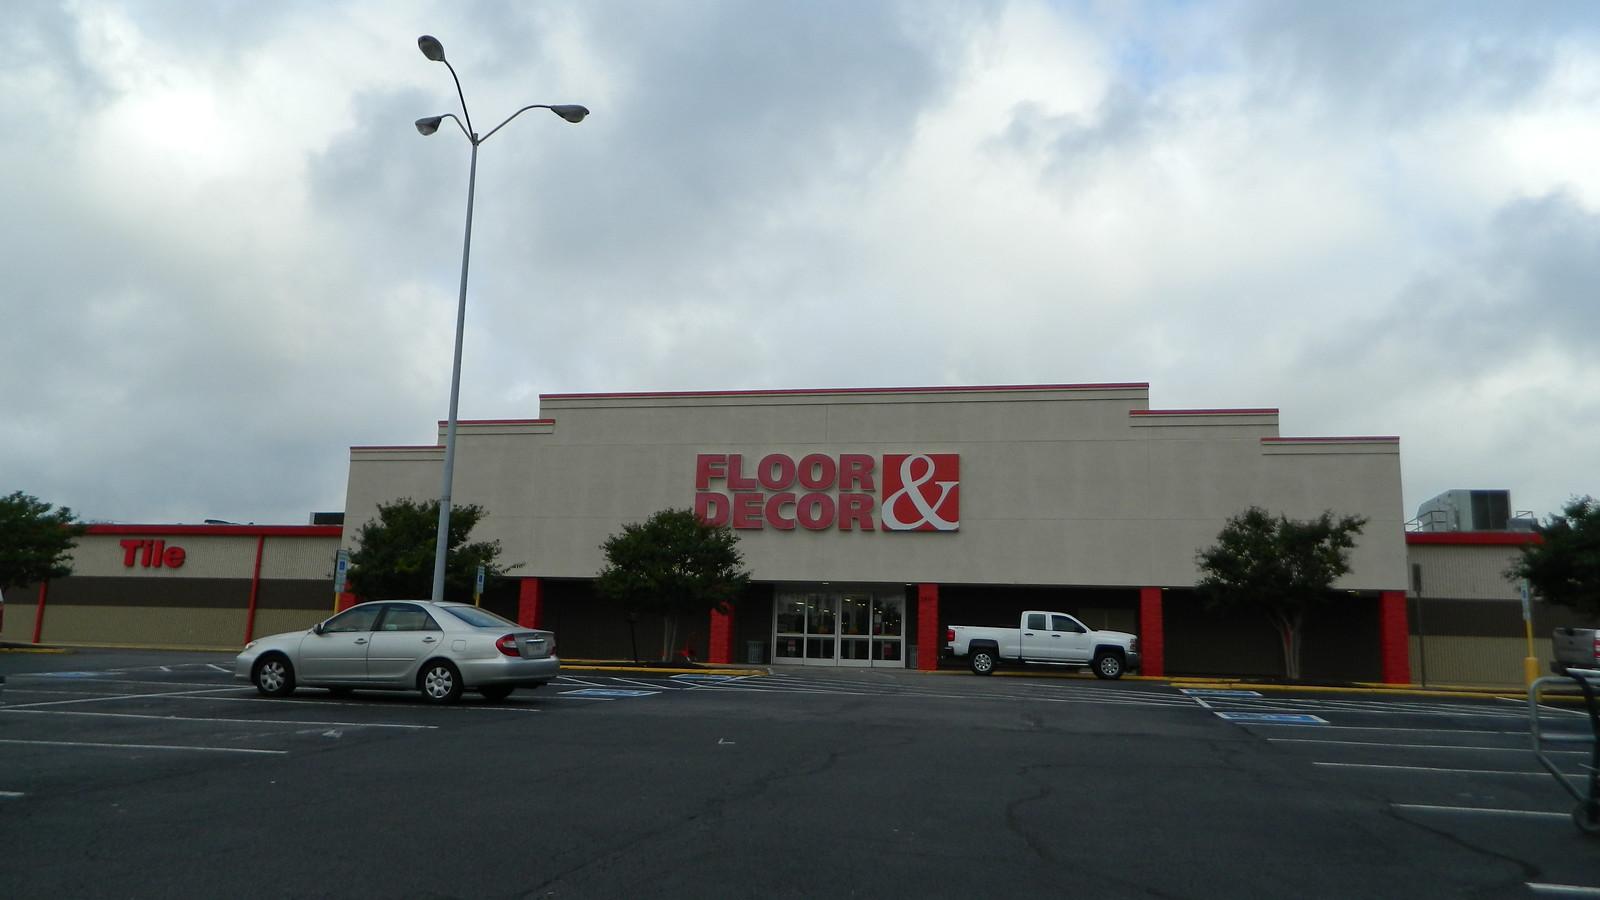 Big Kmart Closed Mission Bbq Floor Decor Crunch Fitness